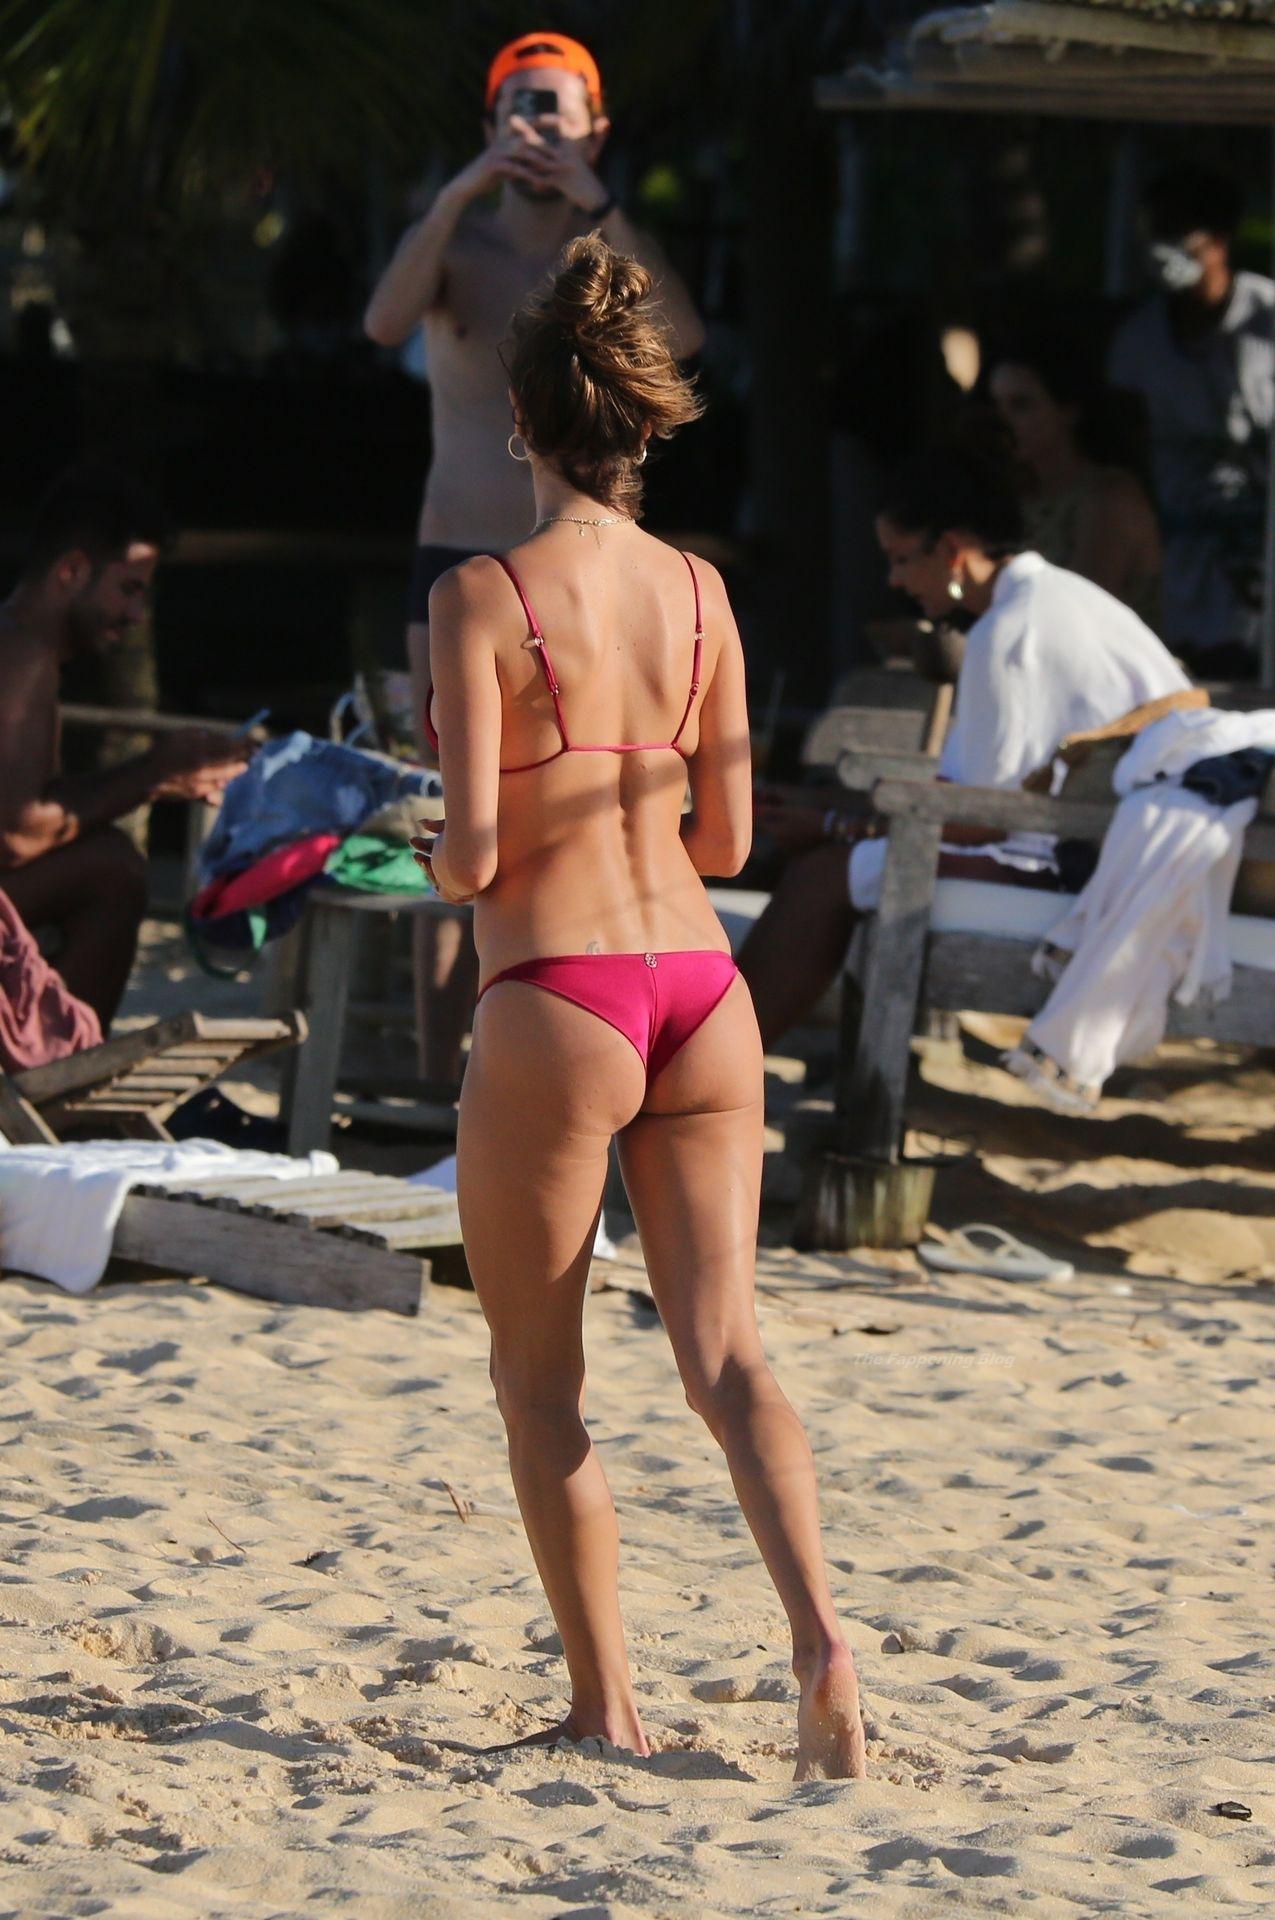 Alessandra-Ambrosio-Sexy-41-thefappeningblog.com_-1.jpg